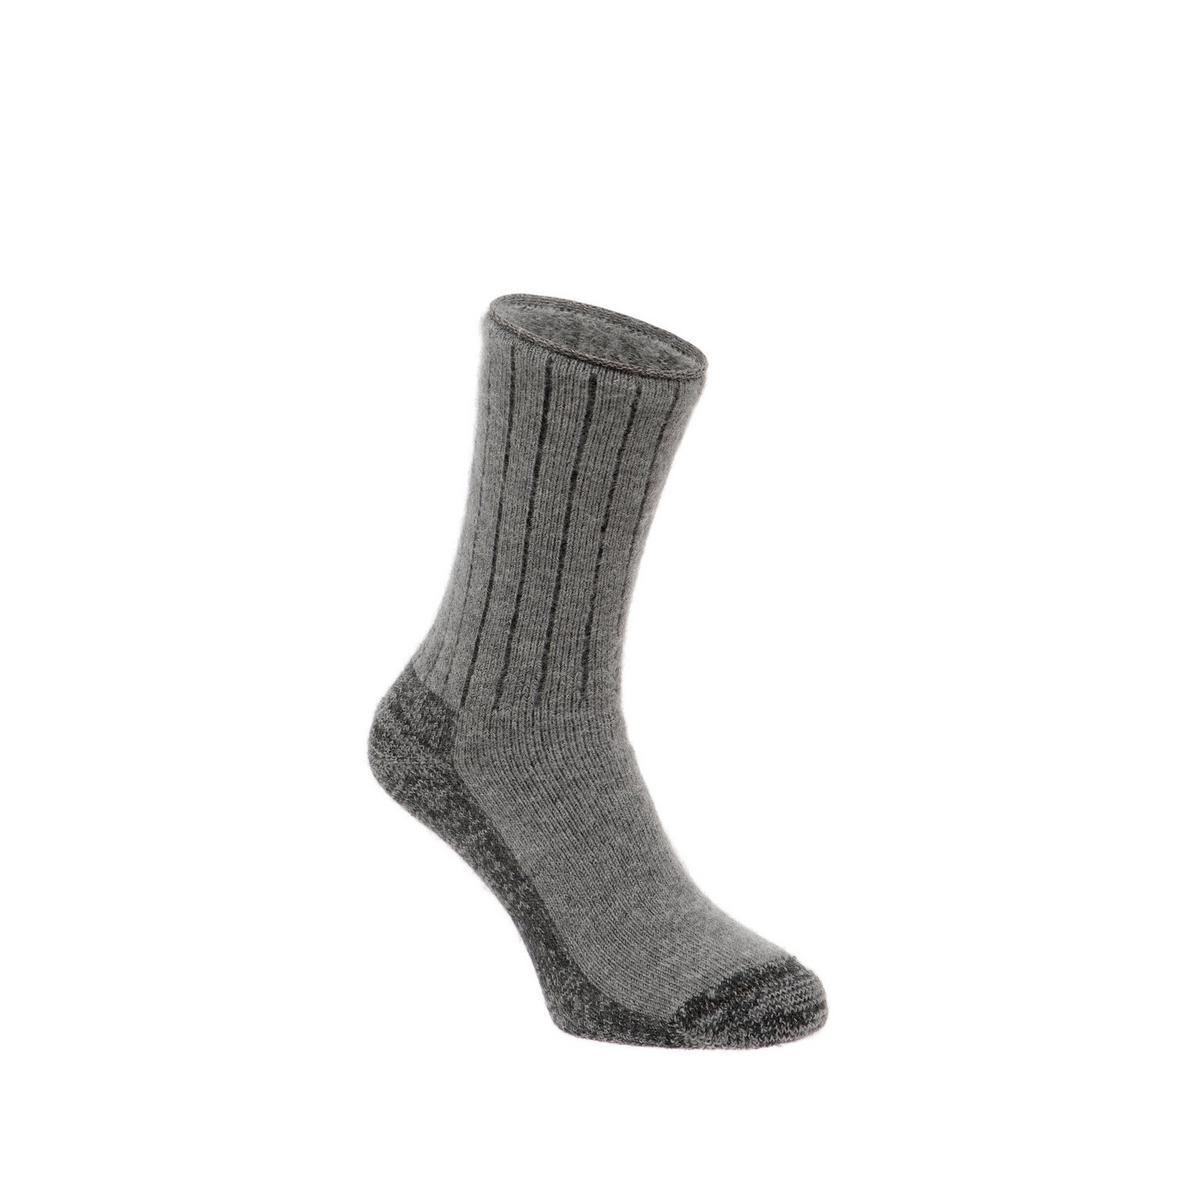 Vicuna Unisex Soft Top - Light Grey